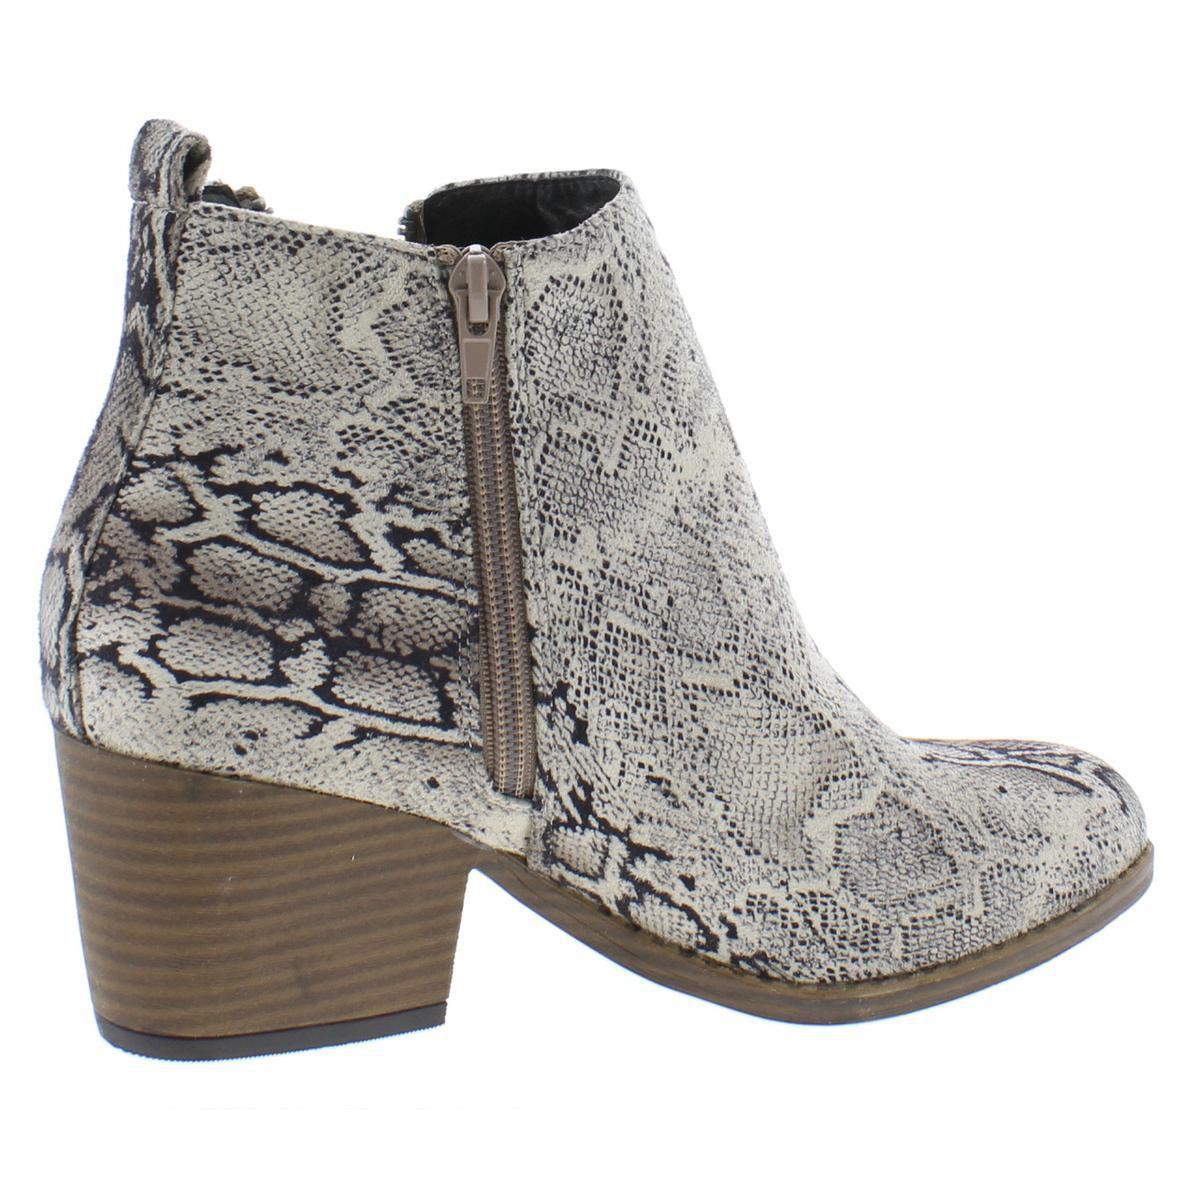 Boutique by Corkys Womens Fashion - Ankle Black-White Size 10 Medium (B,M)